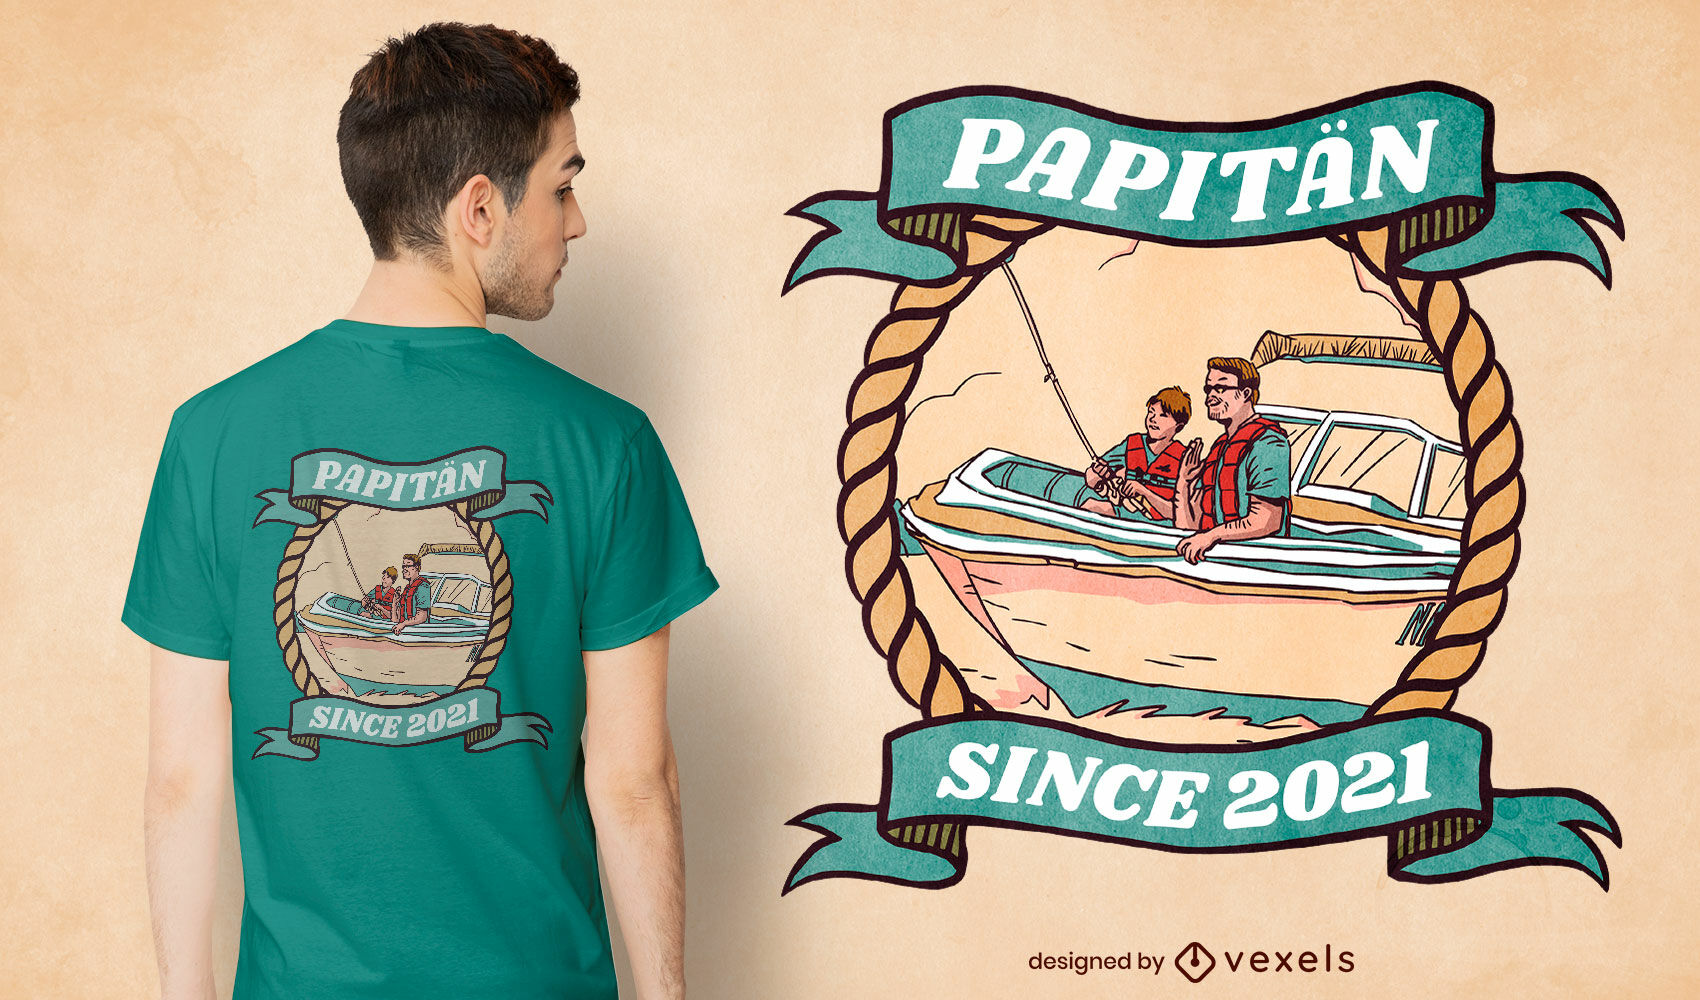 Padre e hijo en diseño de camiseta de barco.